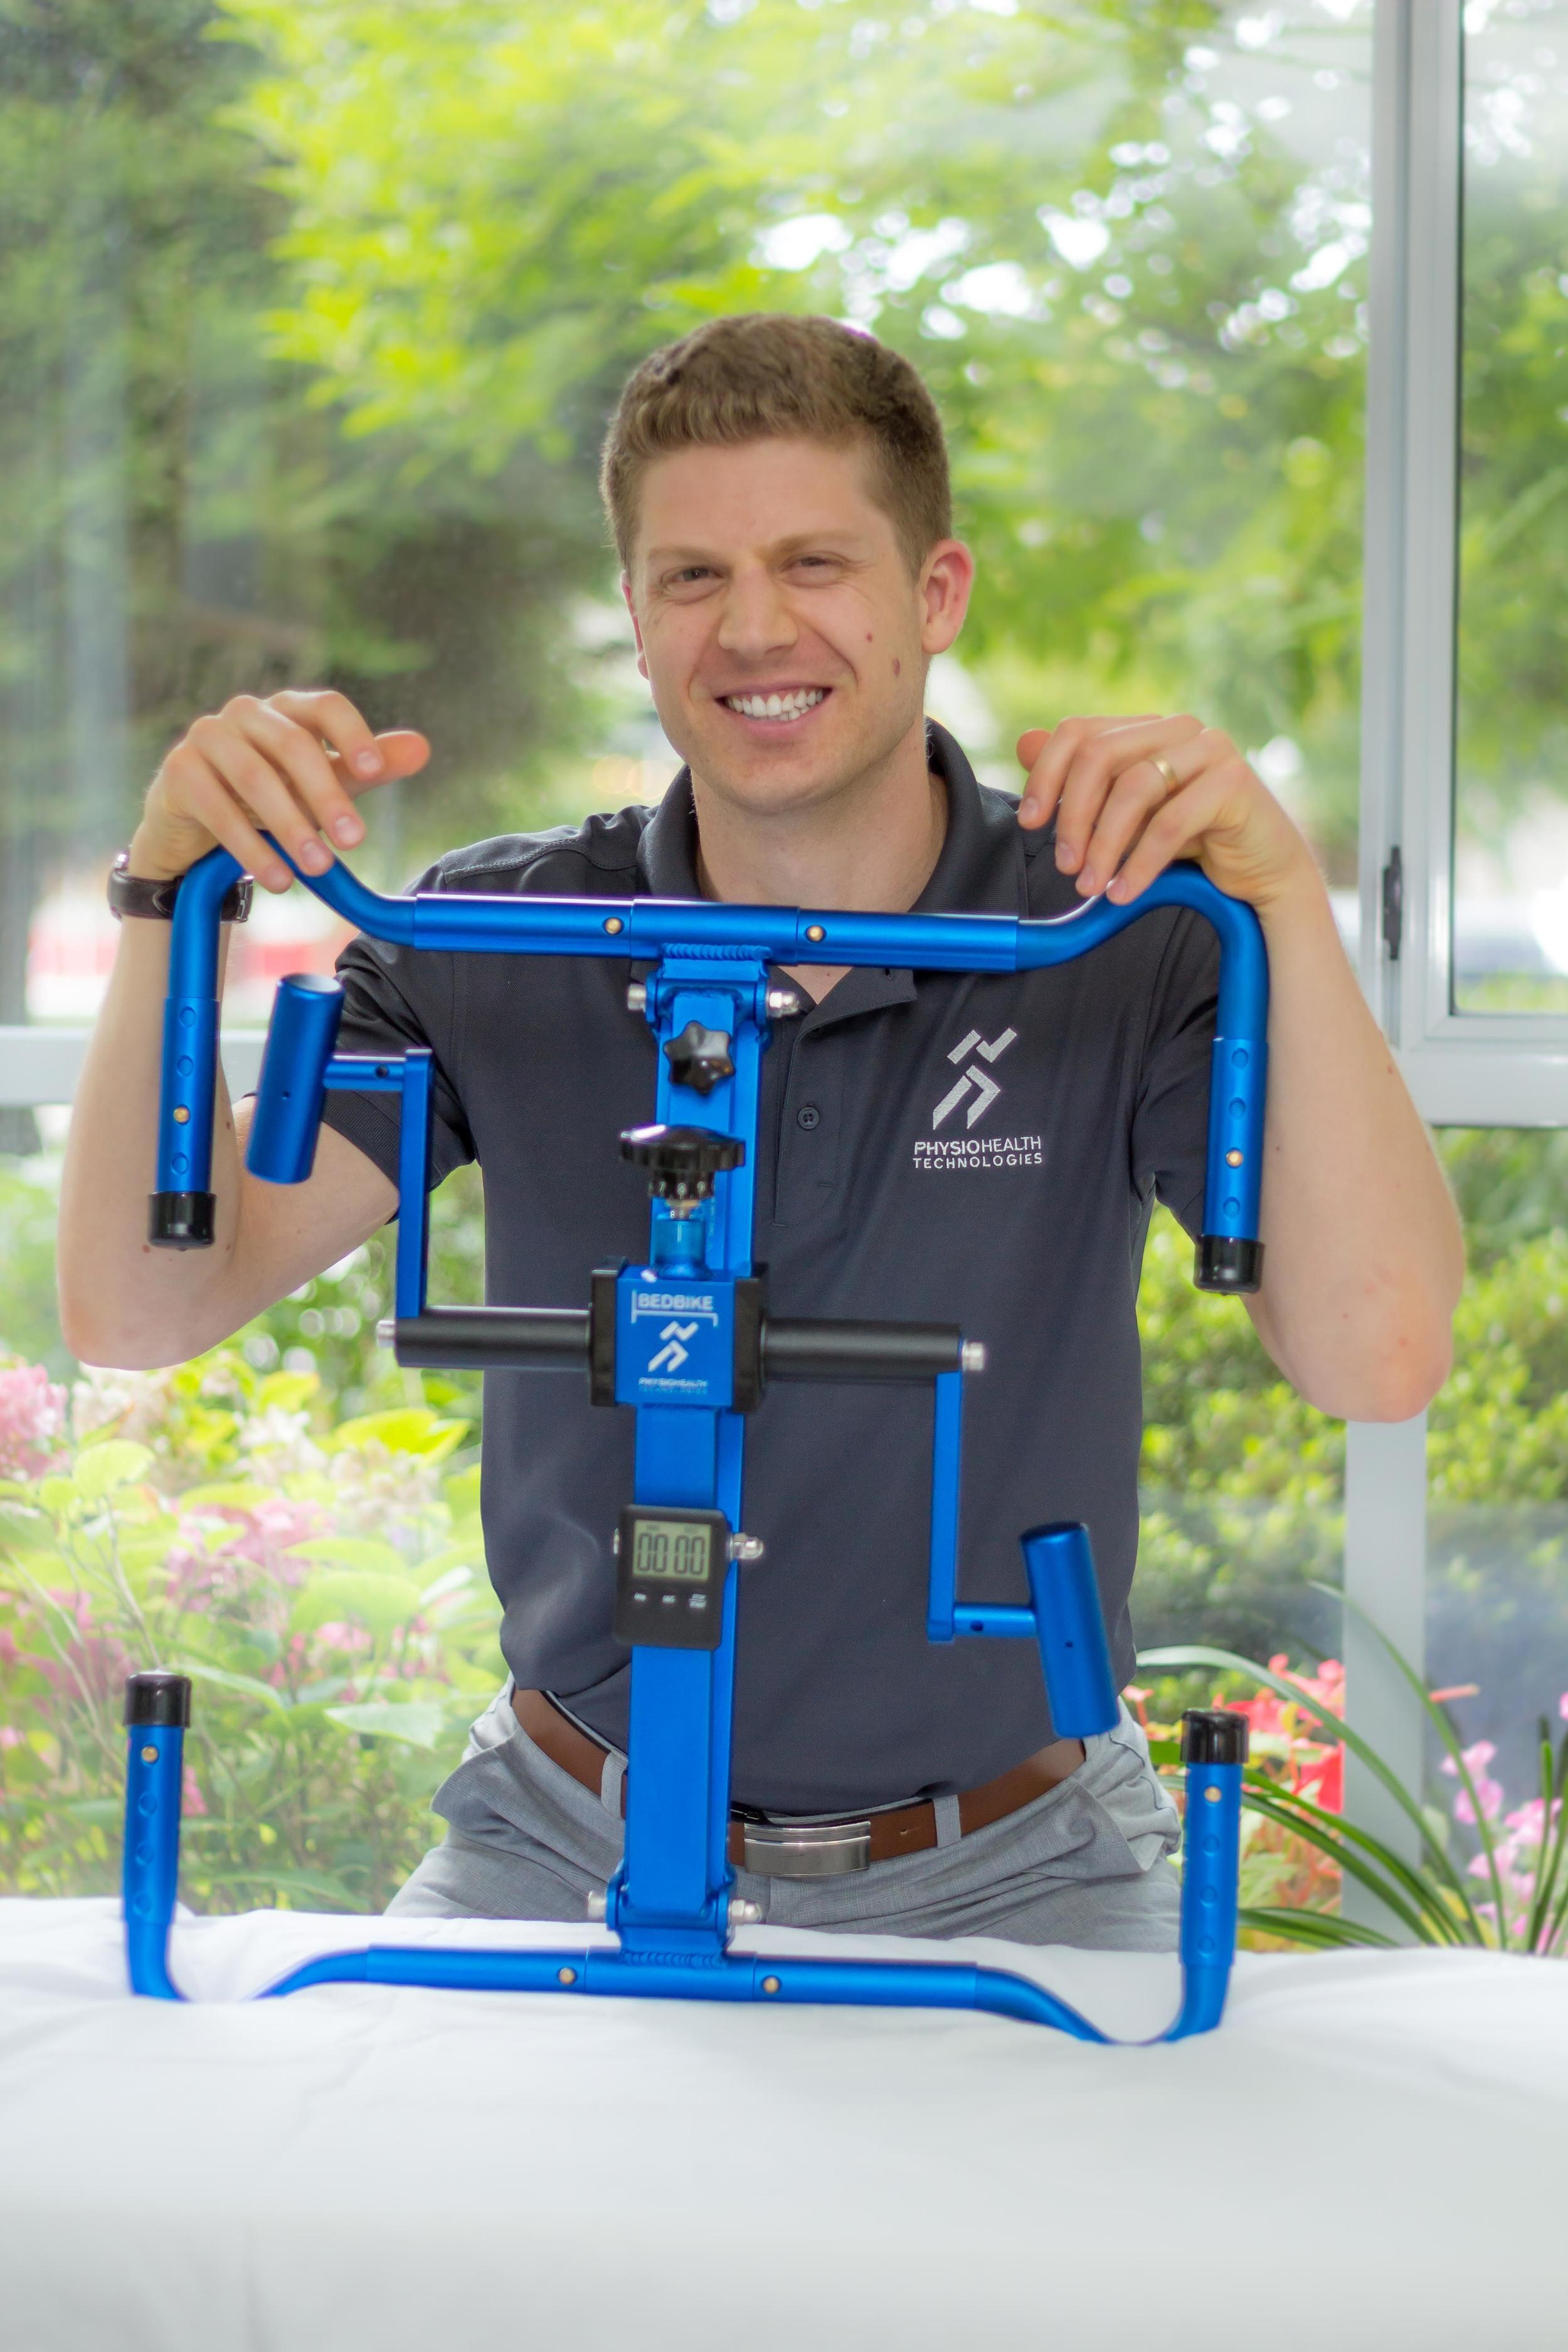 Kyle Freedman, inventor of BedBike, a portable arm ergometer